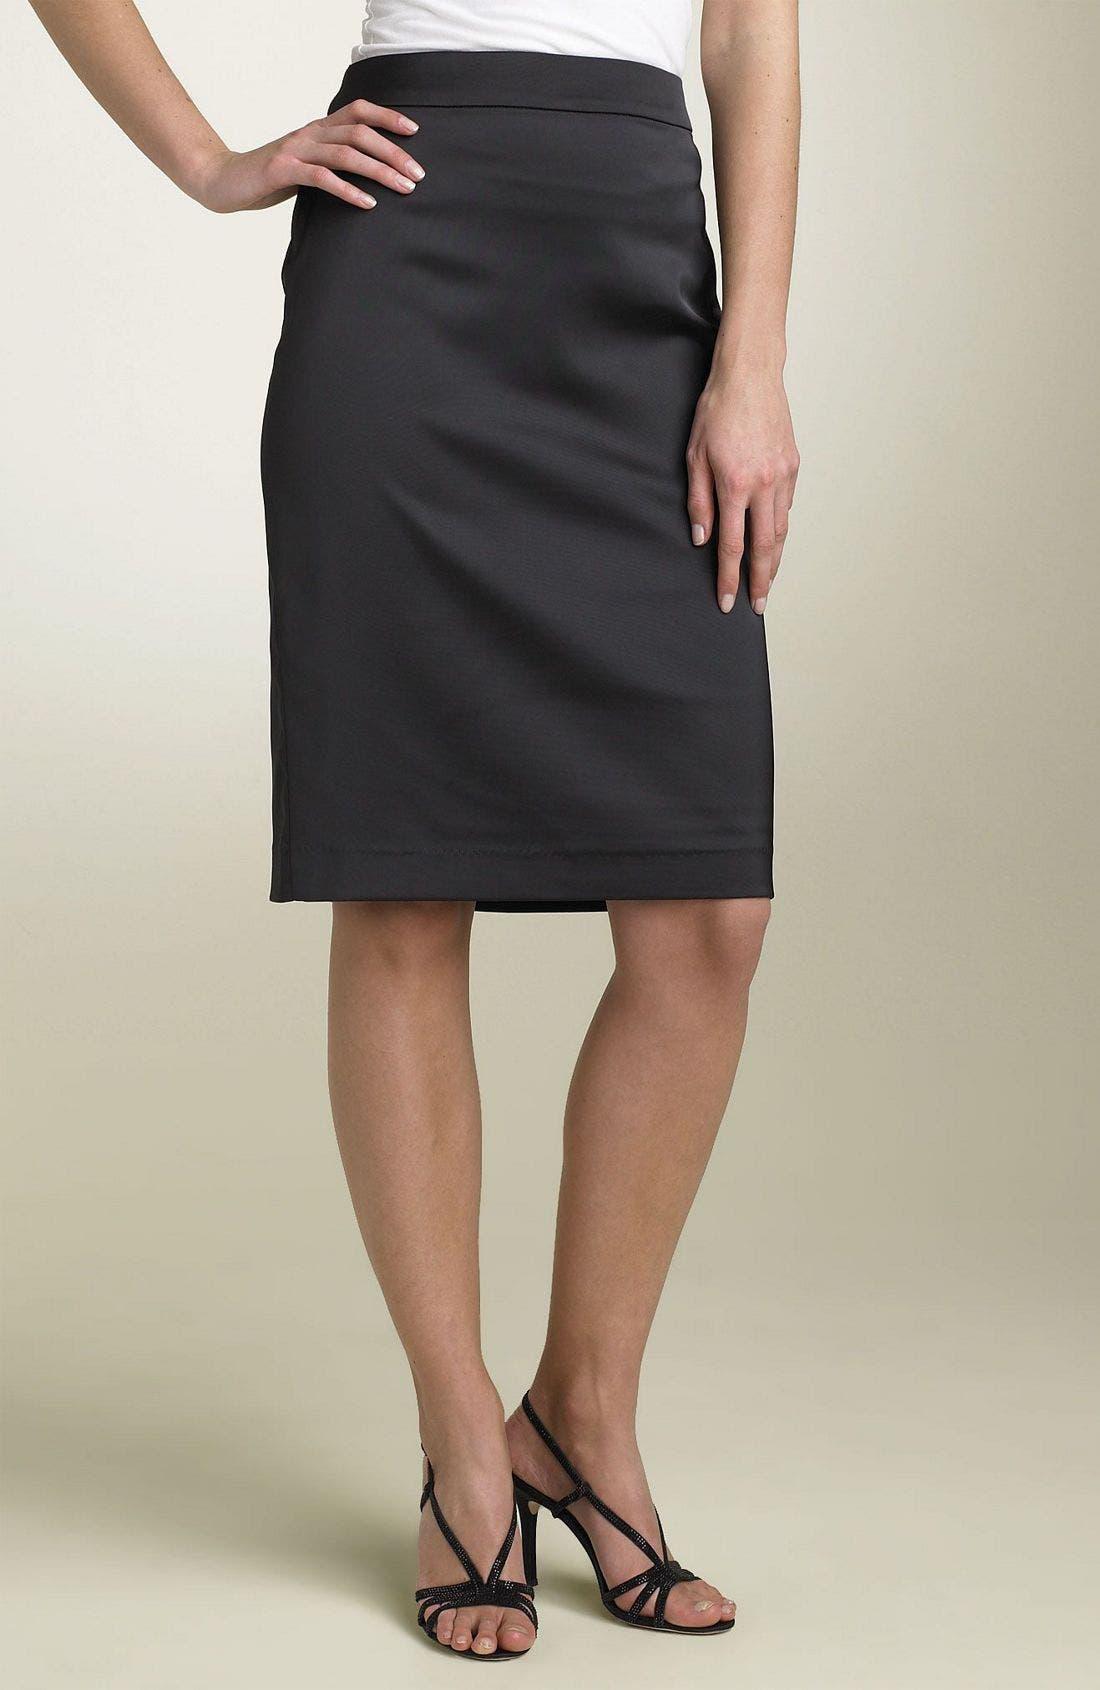 Alternate Image 1 Selected - Tadashi Shoji Stretch Satin Pencil Skirt